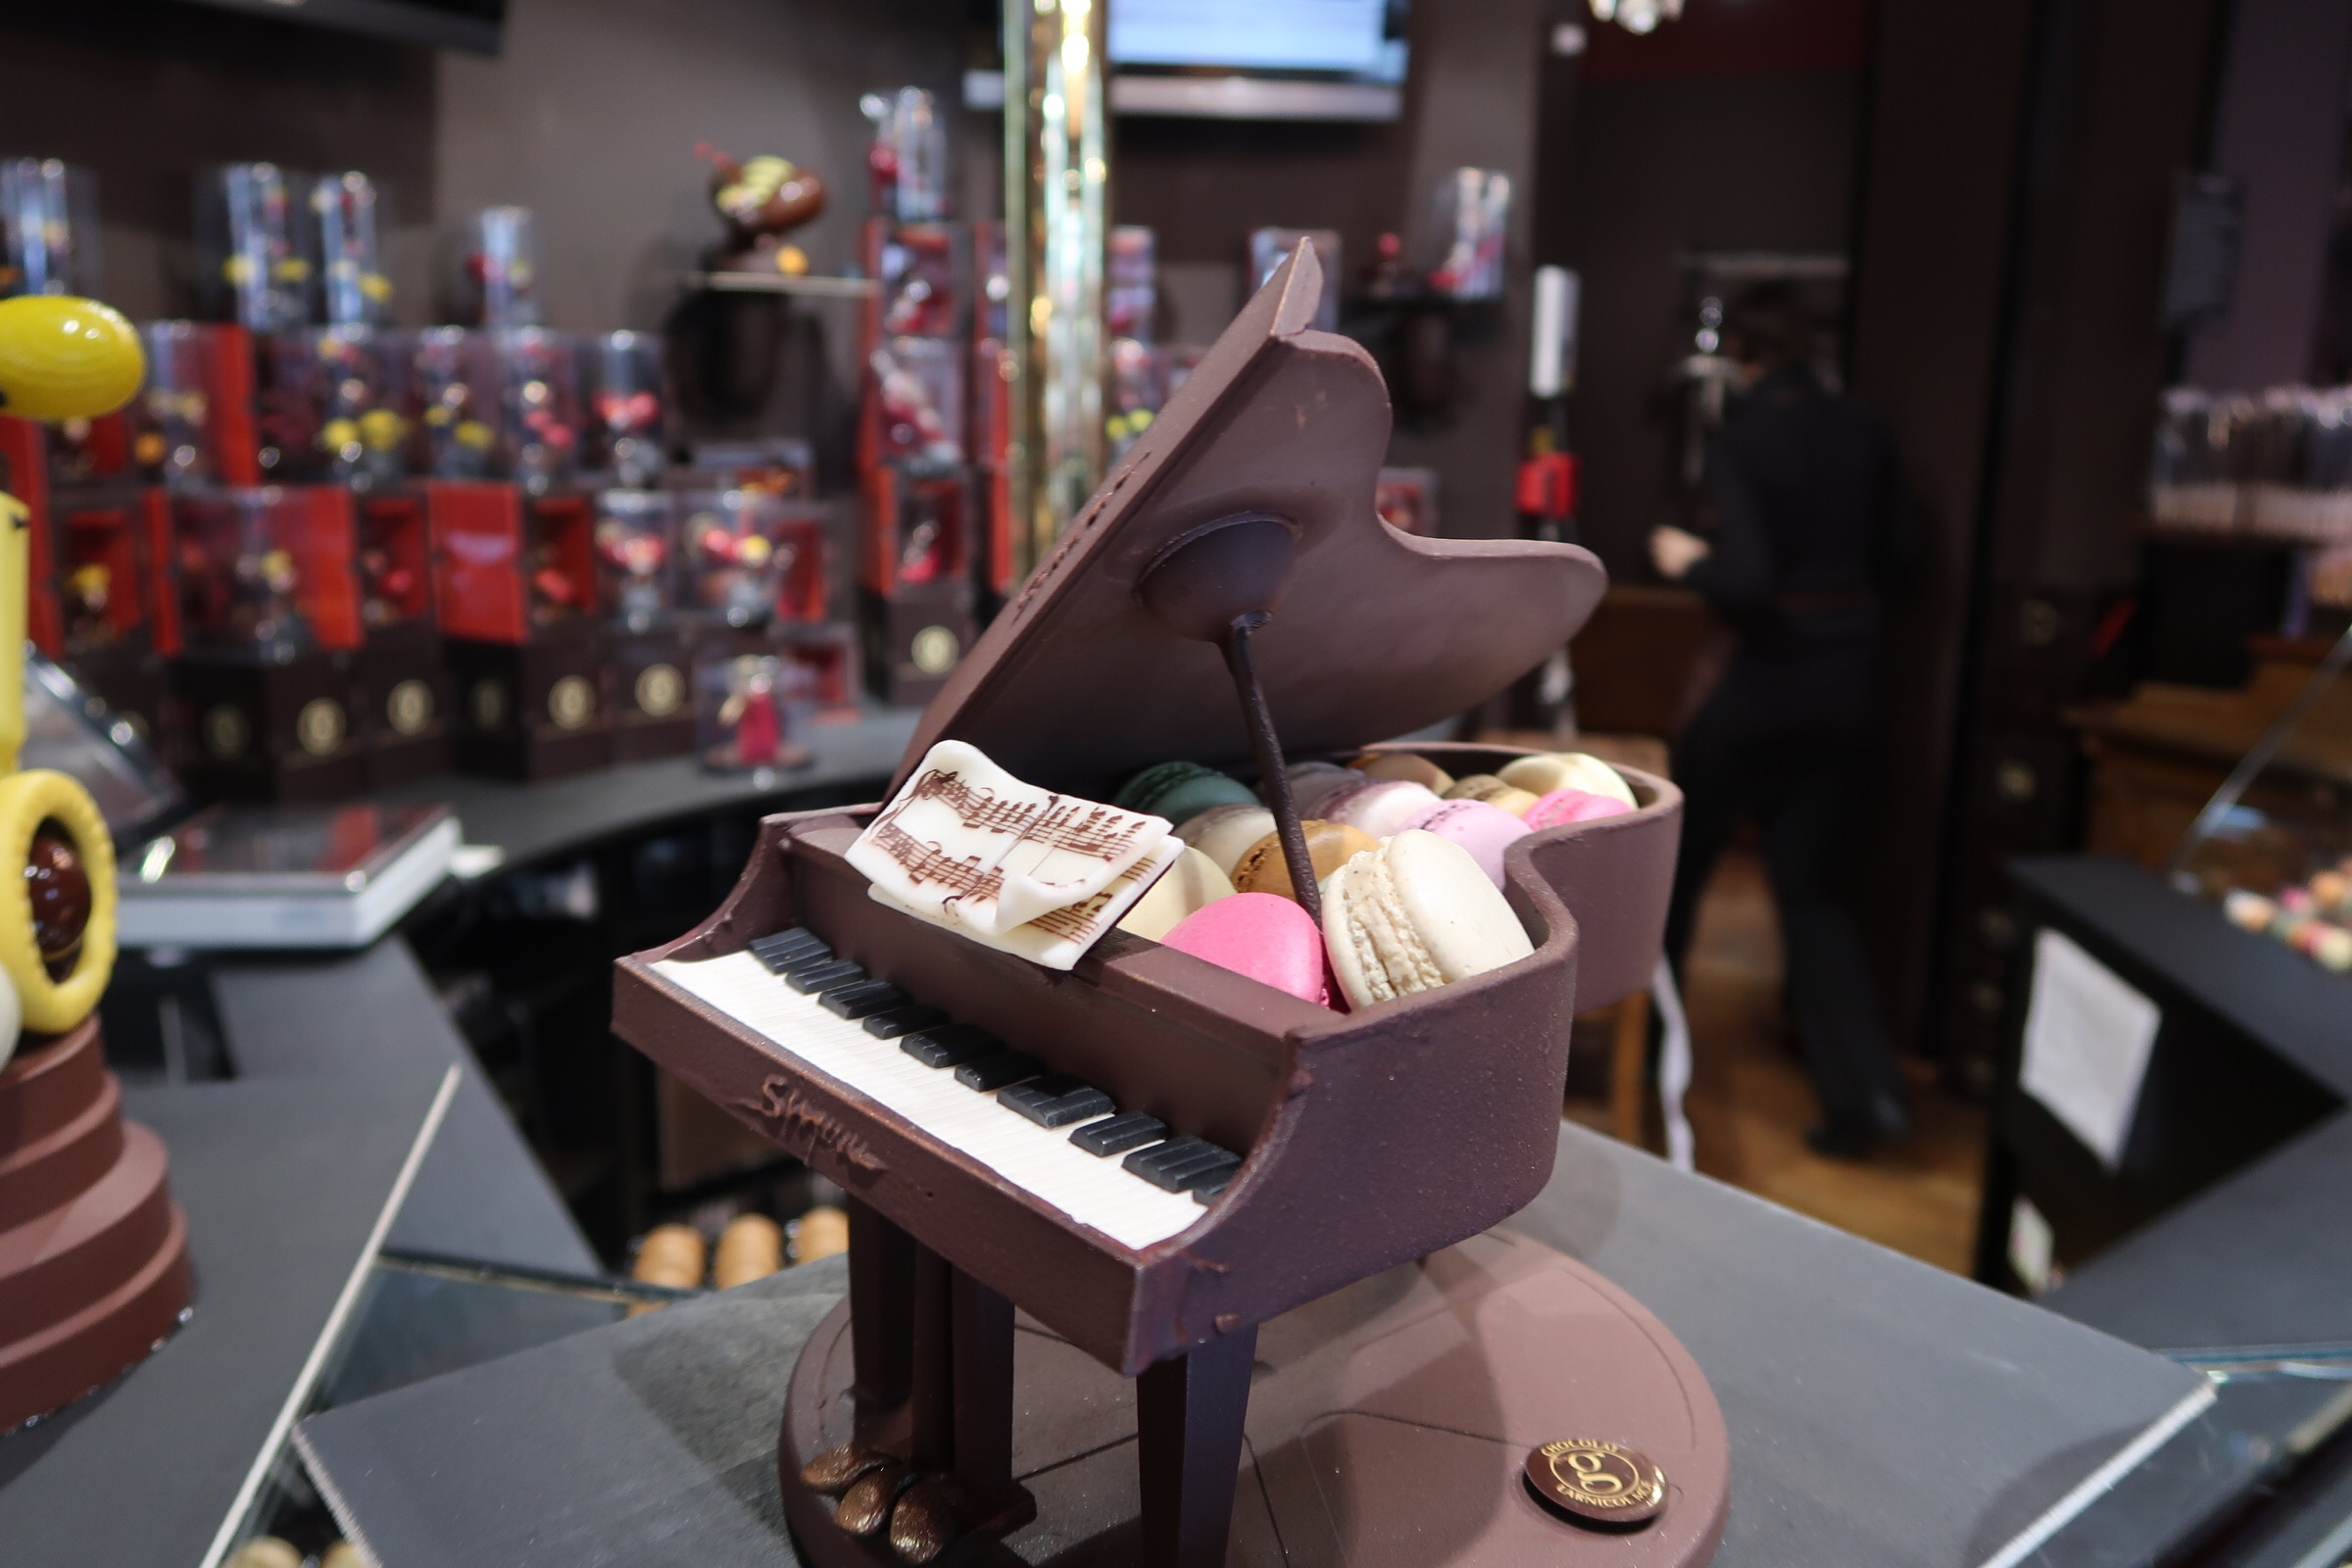 Chocolate Piano and macaroons